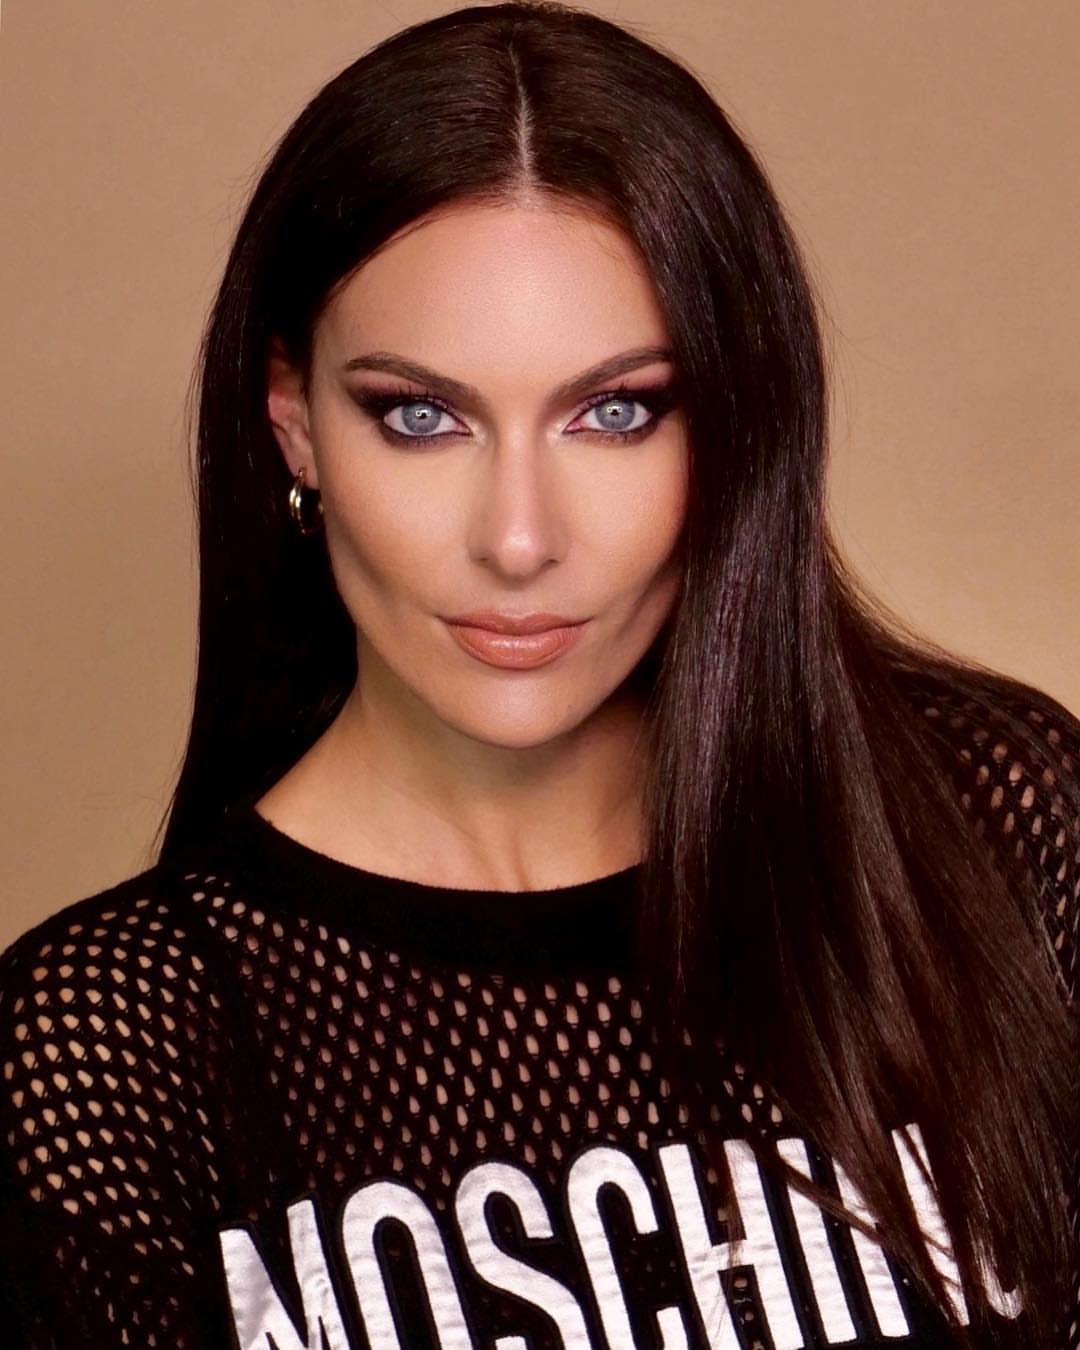 Paola Turani per Nabla Cosmetics